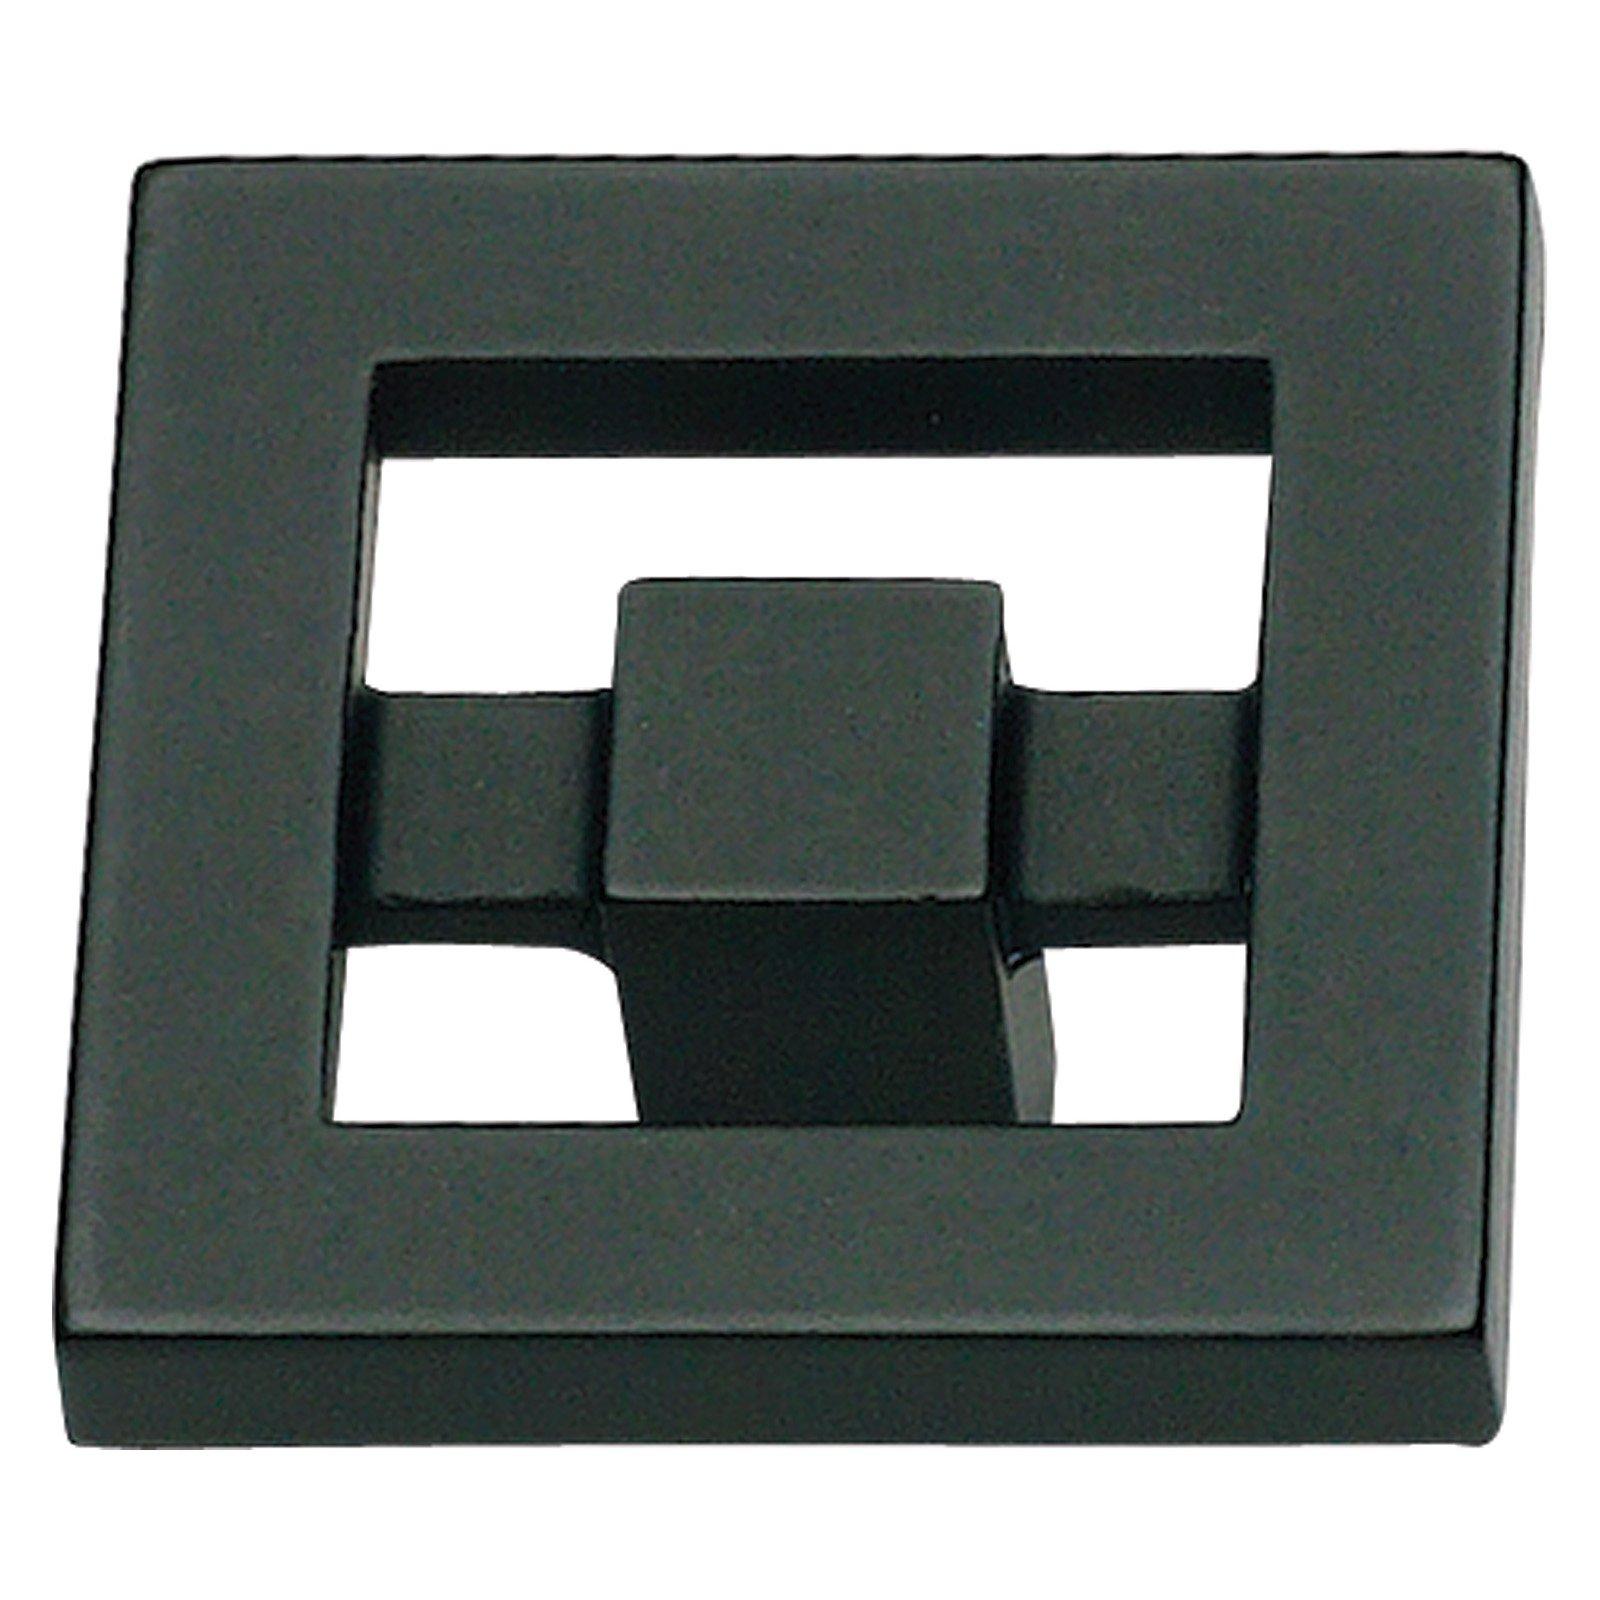 Nobu Collection 1-3/8 in. Black Cabinet Knob